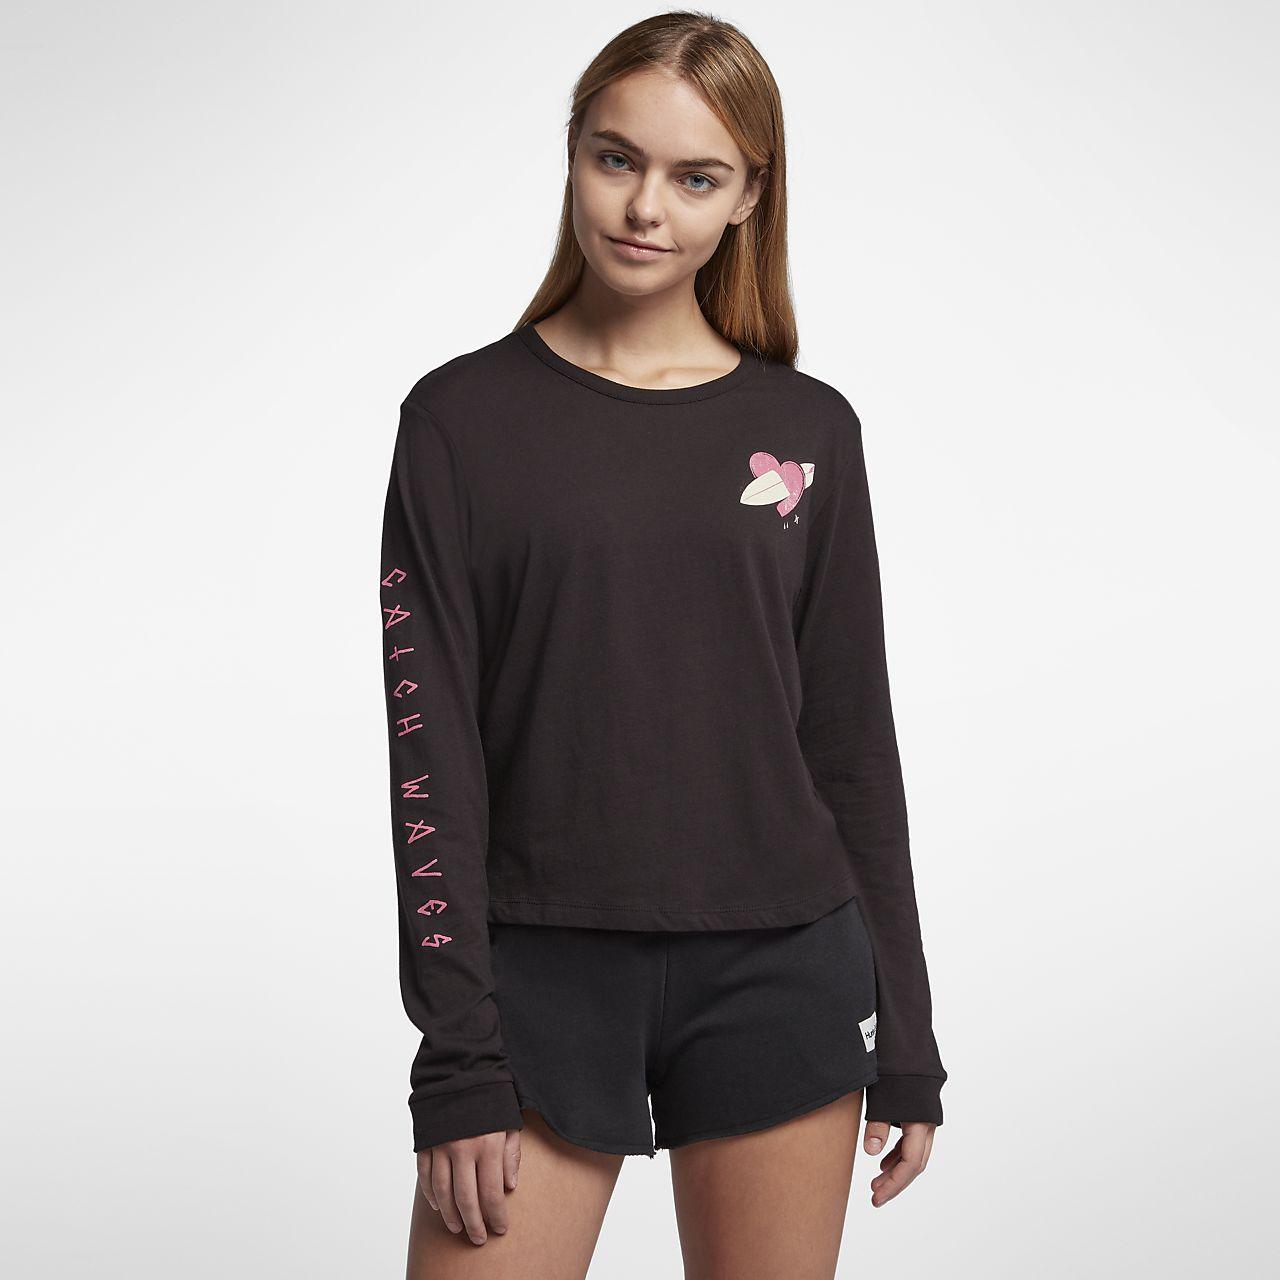 1250e19bbafa63 Hurley Catch Feelings Perfect Langarm-T-Shirt für Damen. Nike.com CH